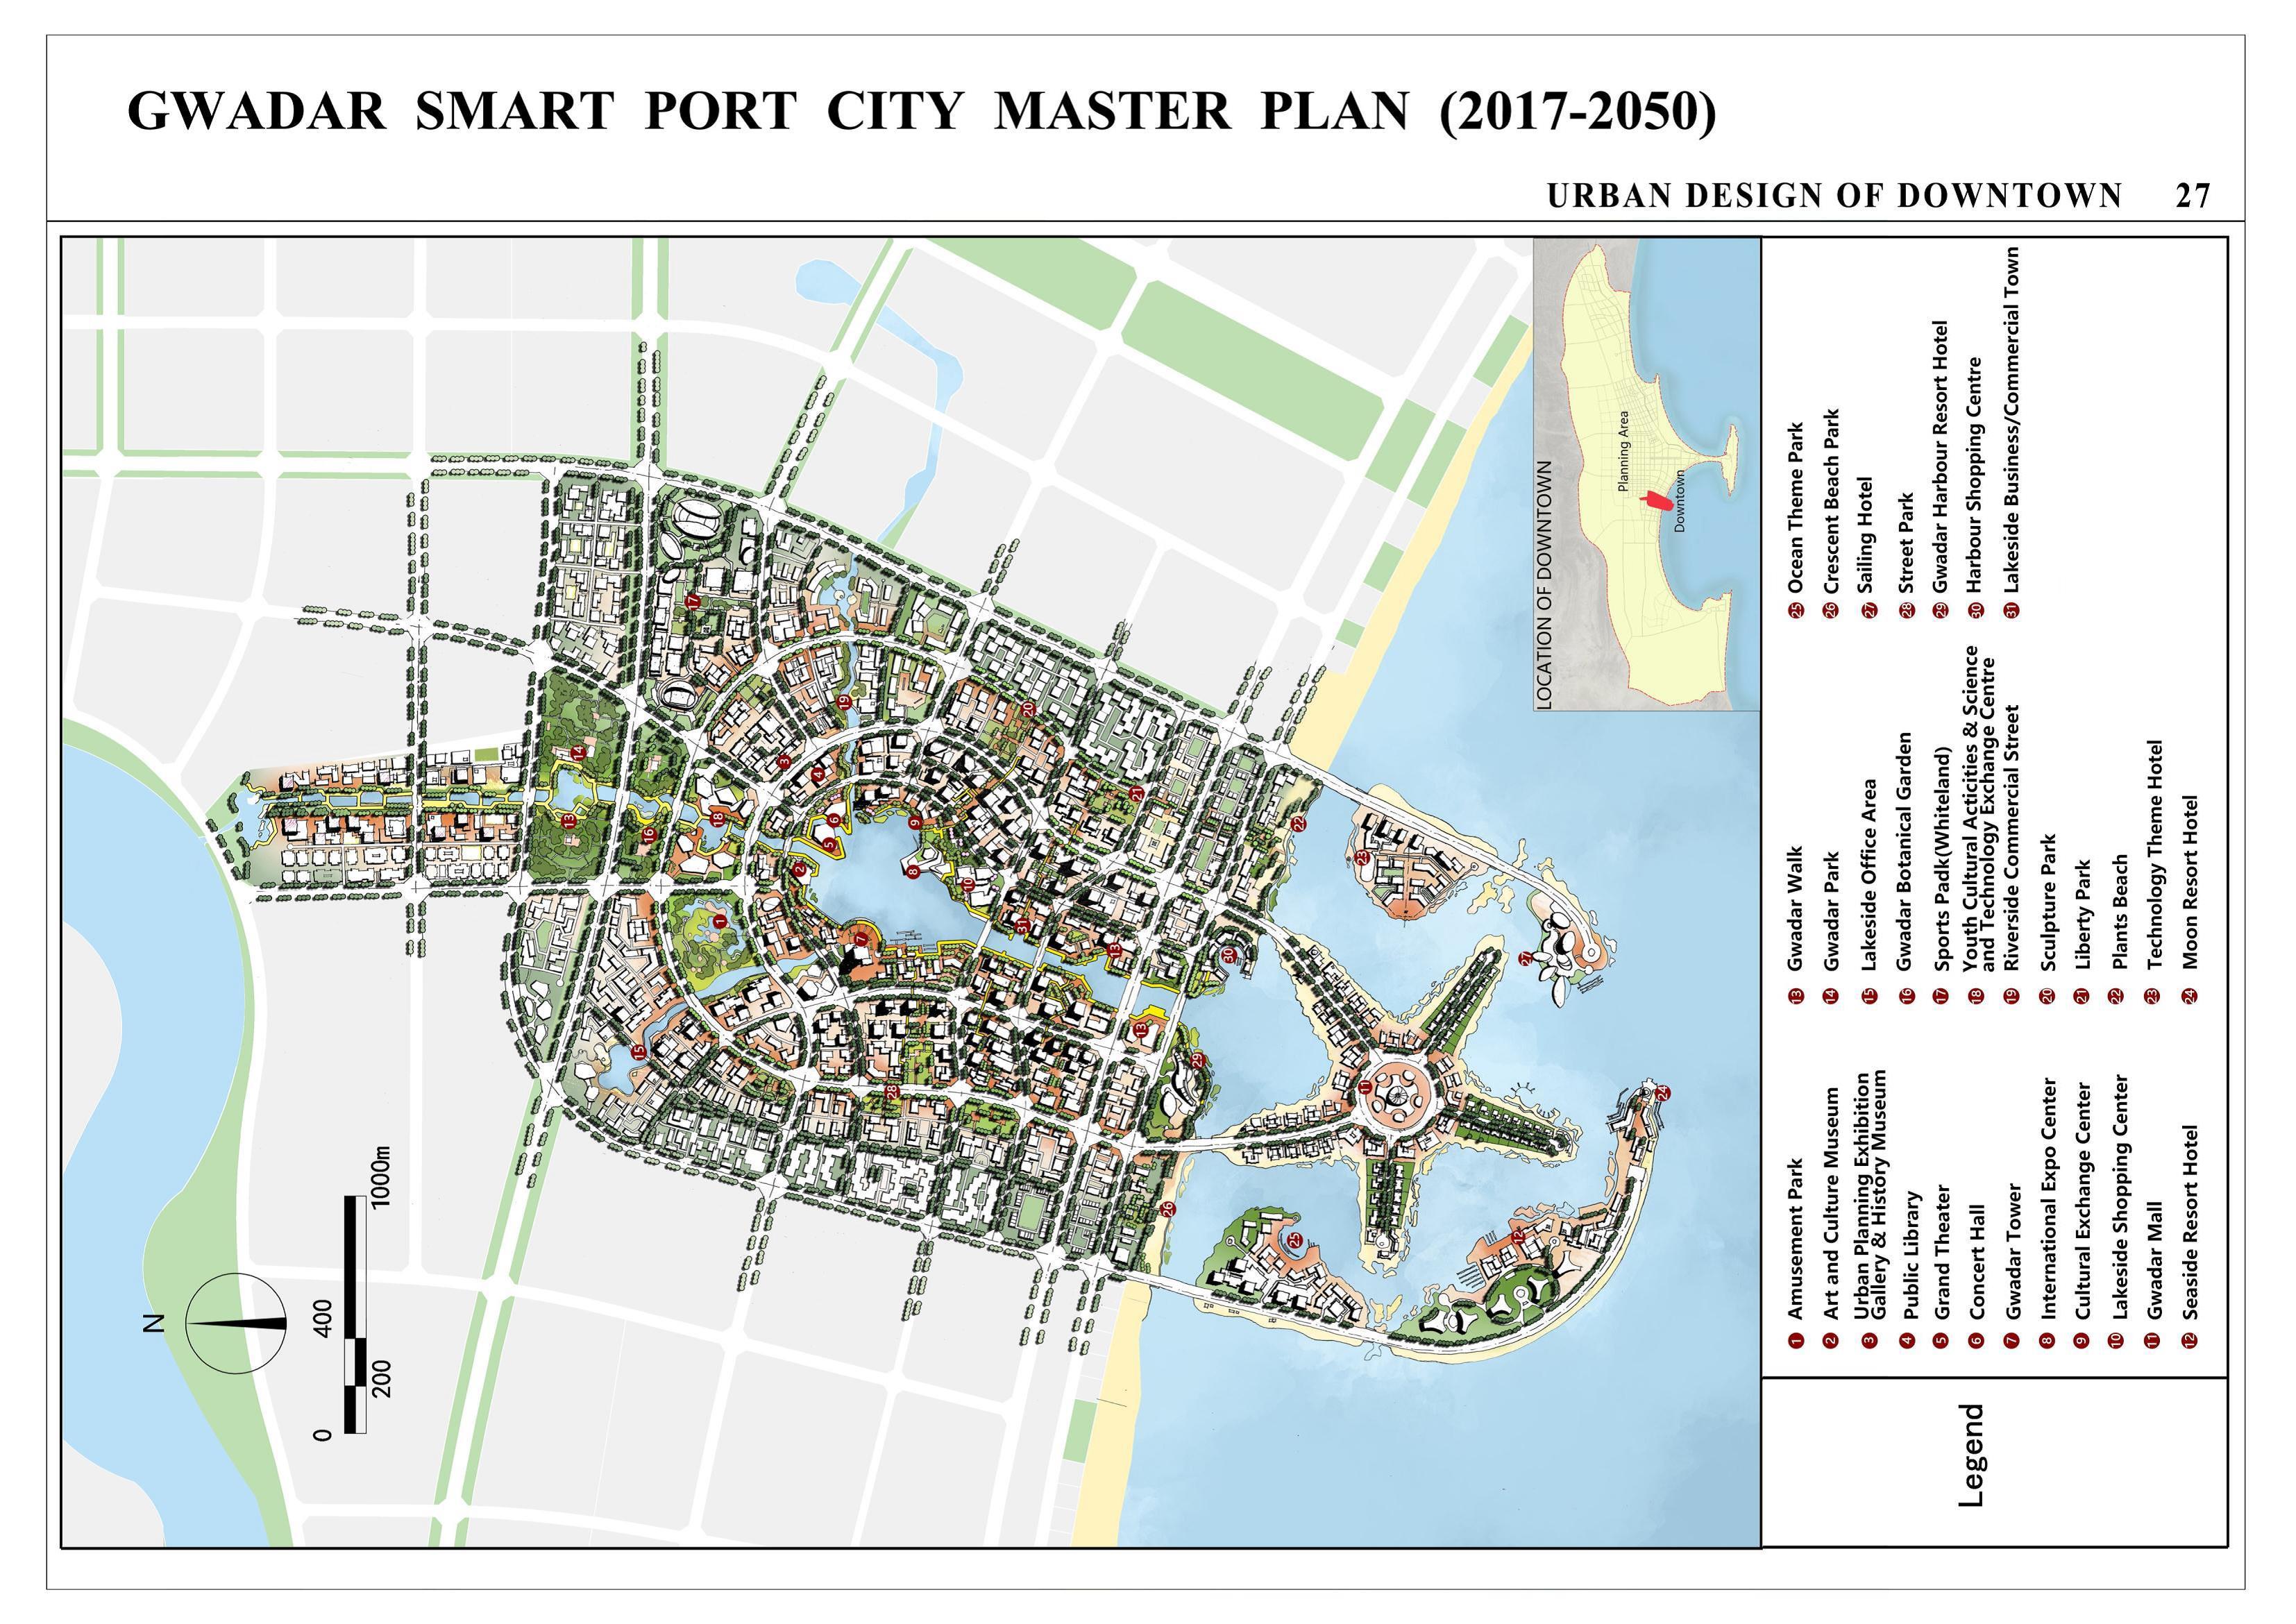 gwadar master plan 2019 map